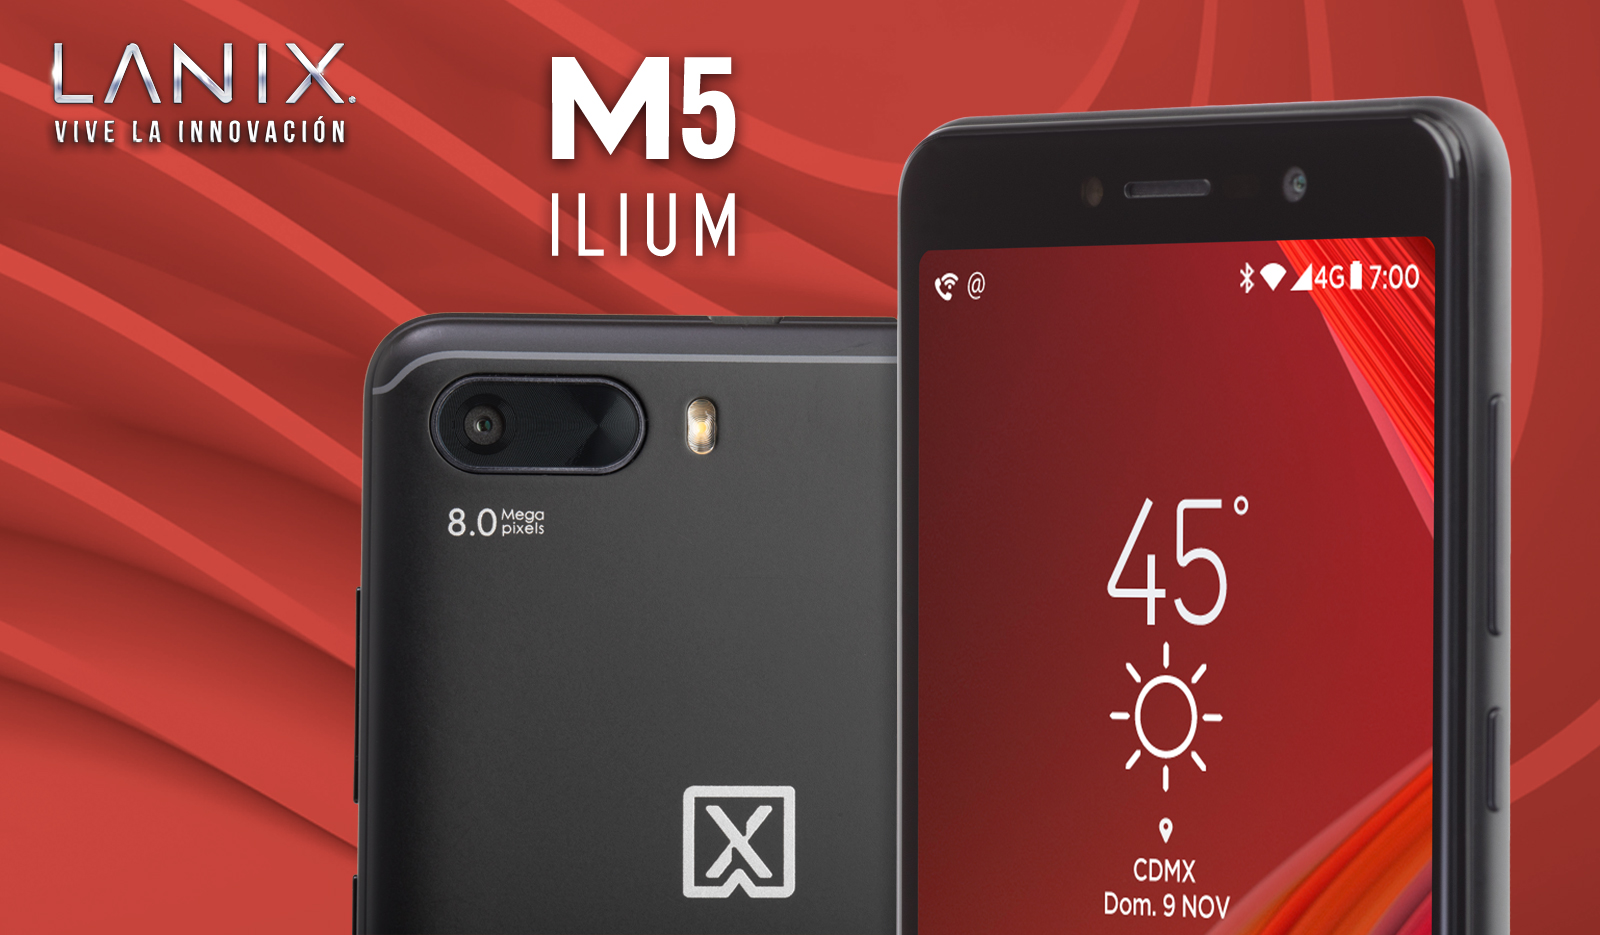 Lanix Ilum M5